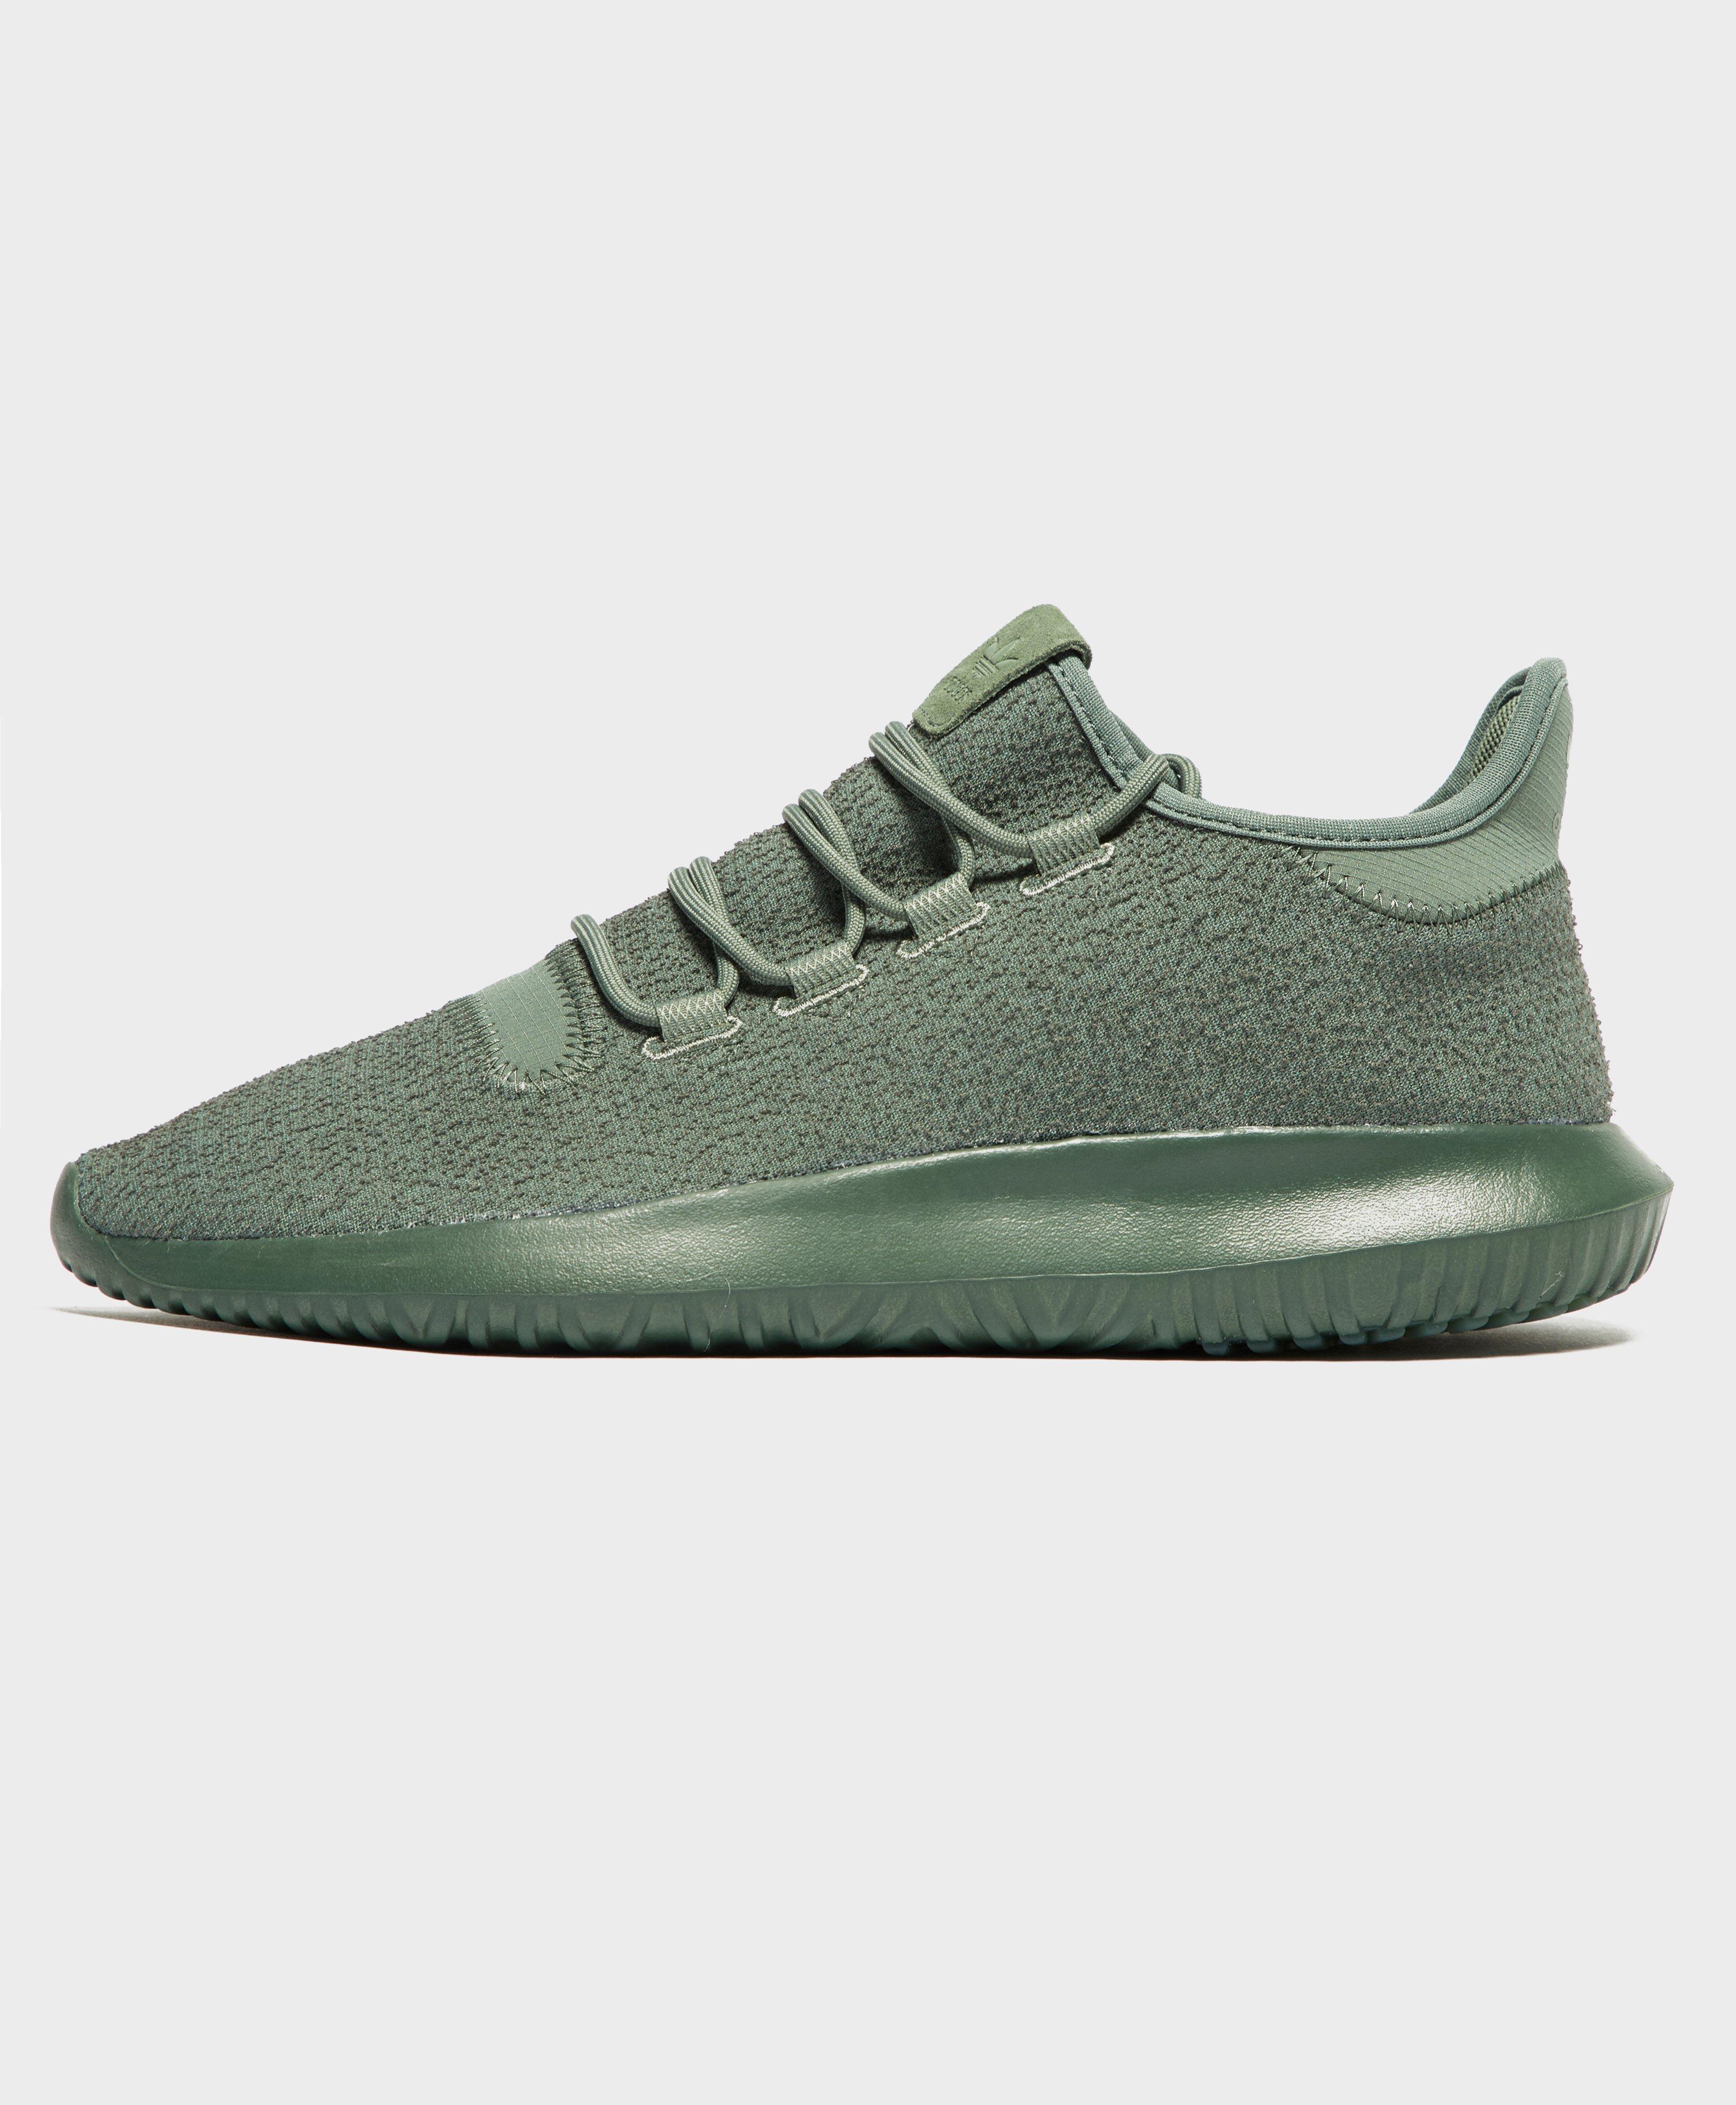 Lyst adidas Originals tubular de sombra en verde para hombres ahorrar 9%